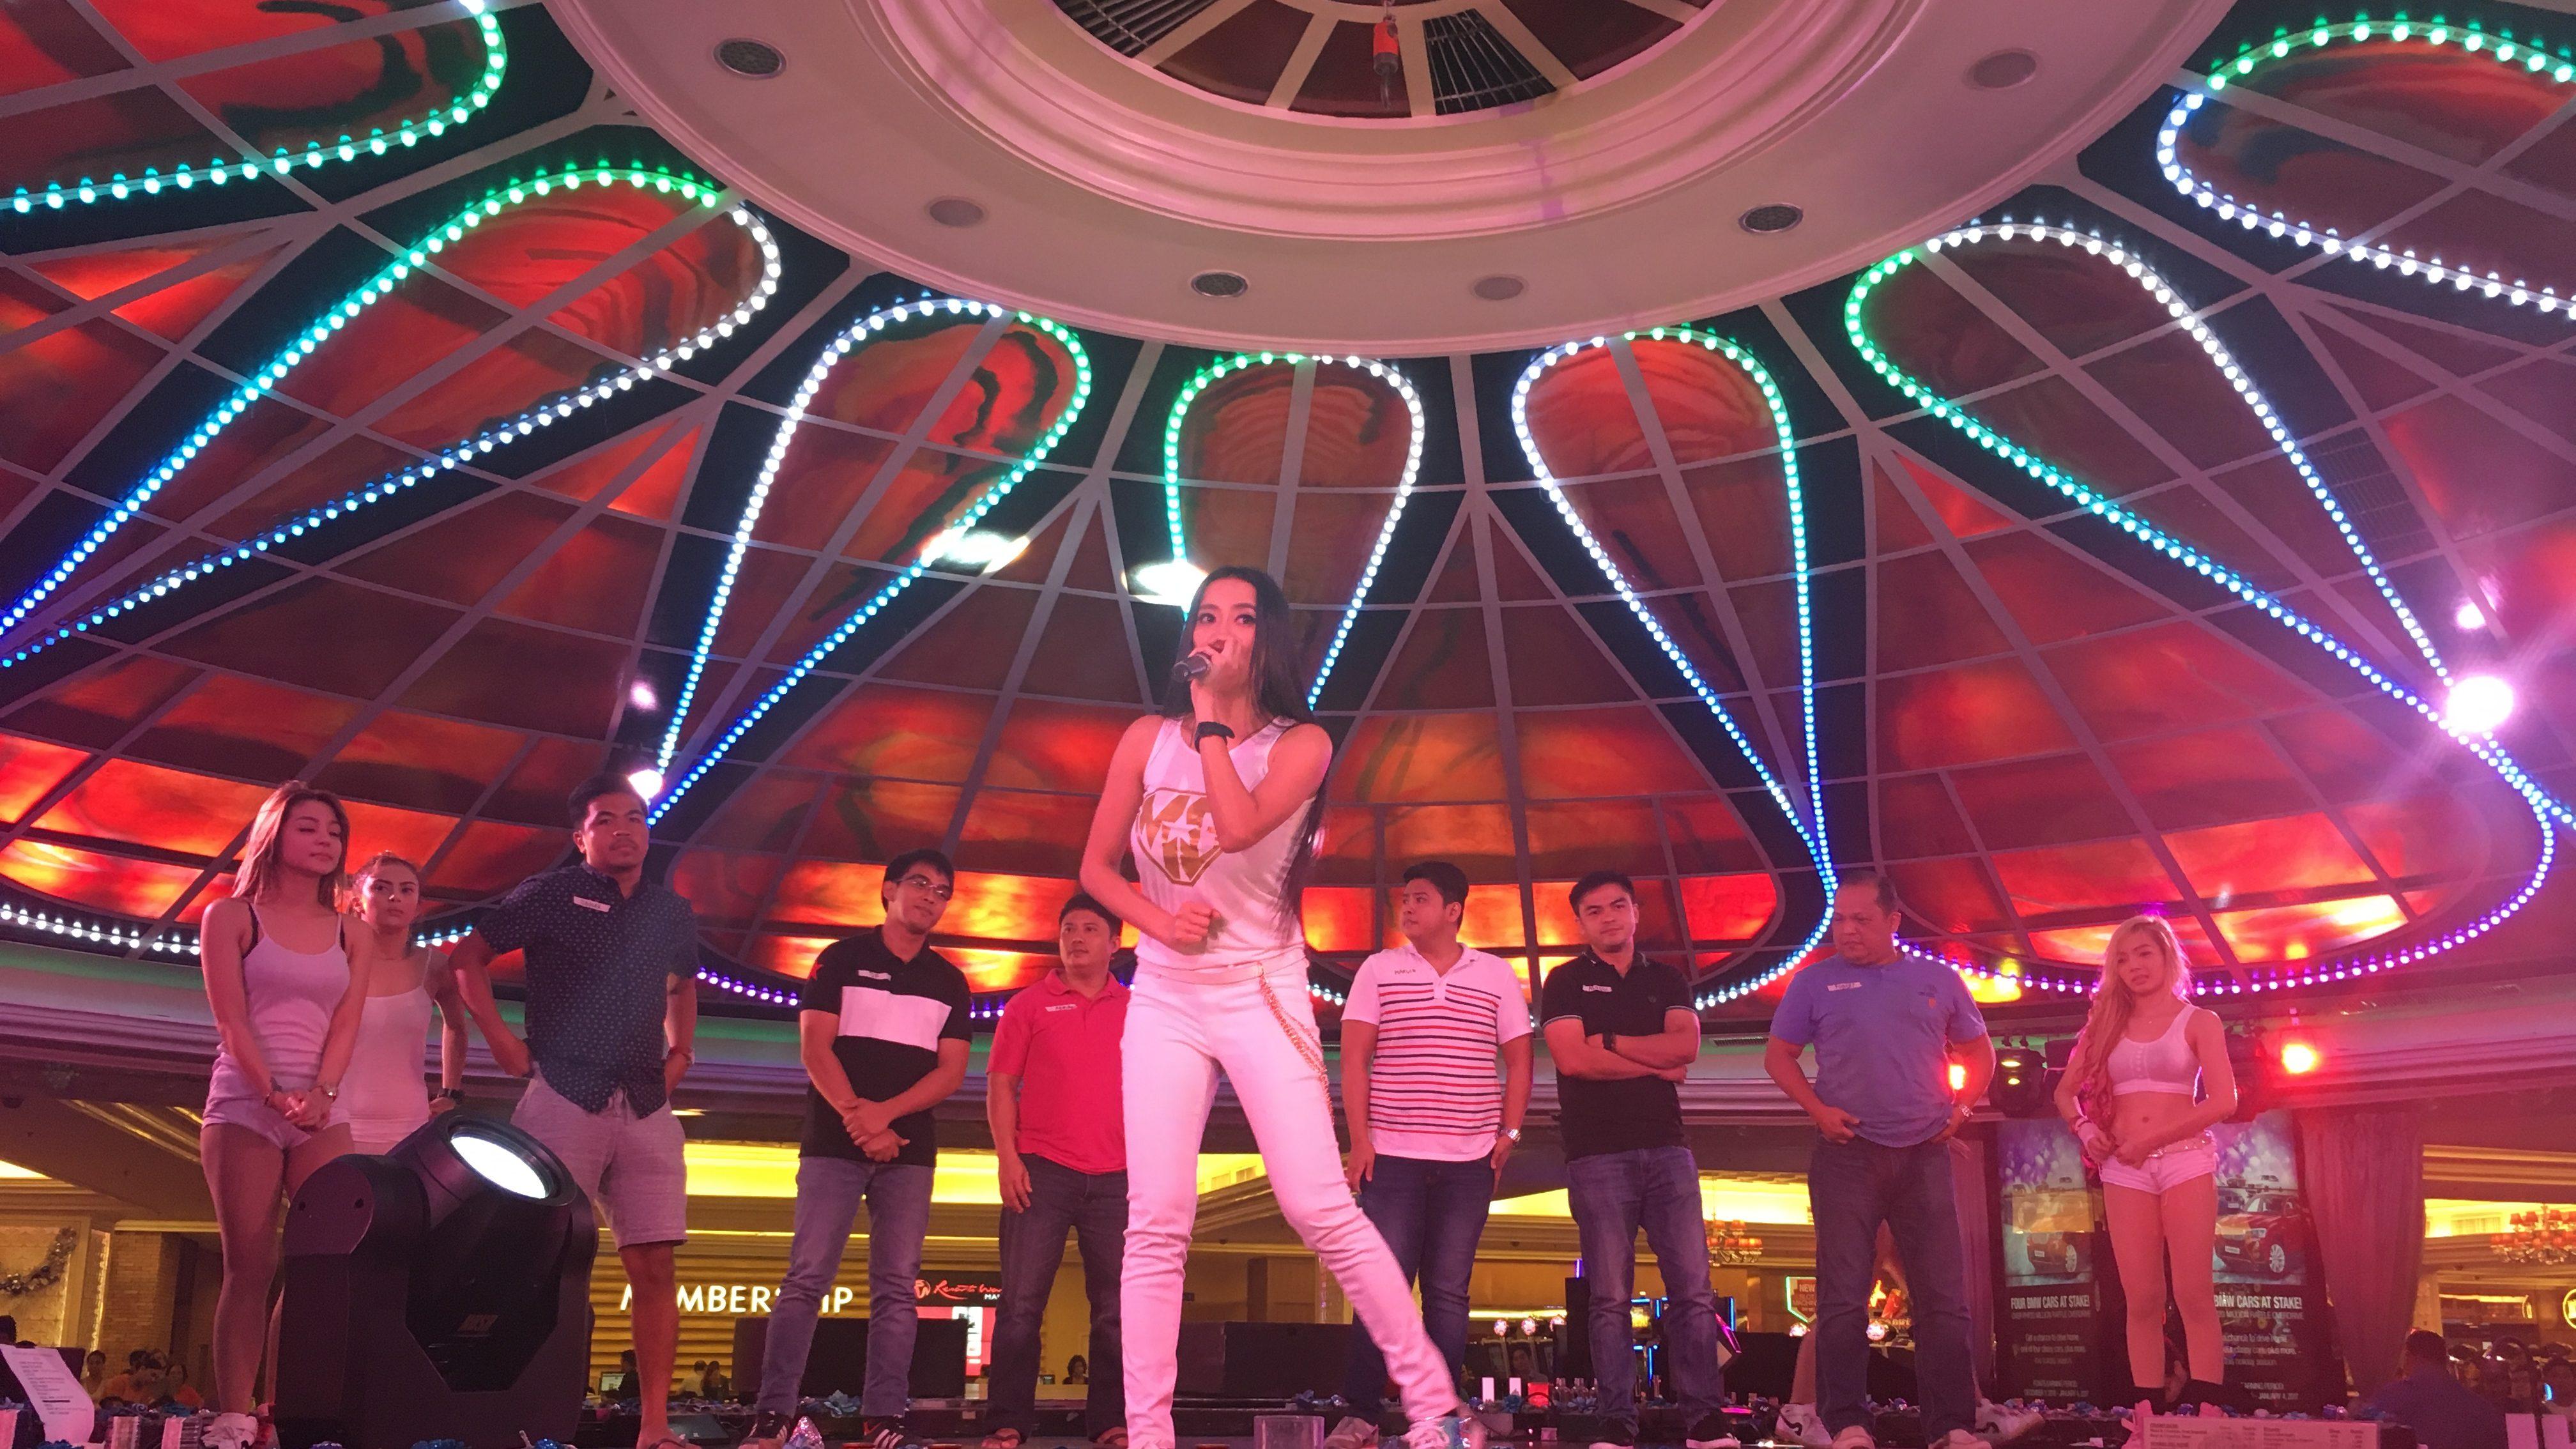 mocha uson with the mocha girls at resorts world manila